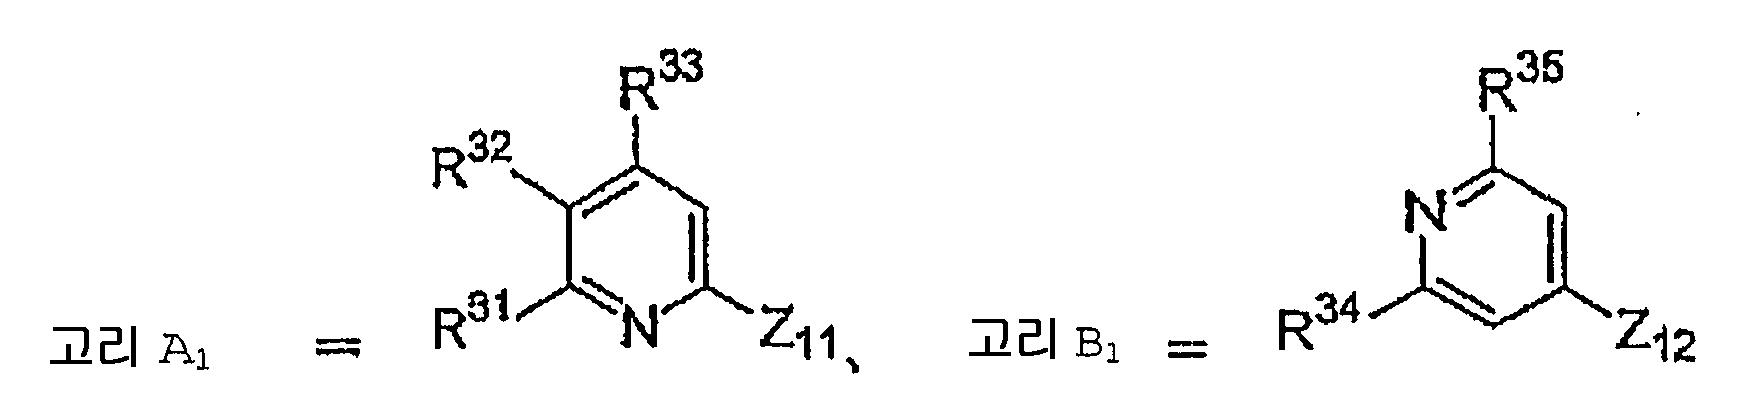 Figure 112010002231902-pat00070